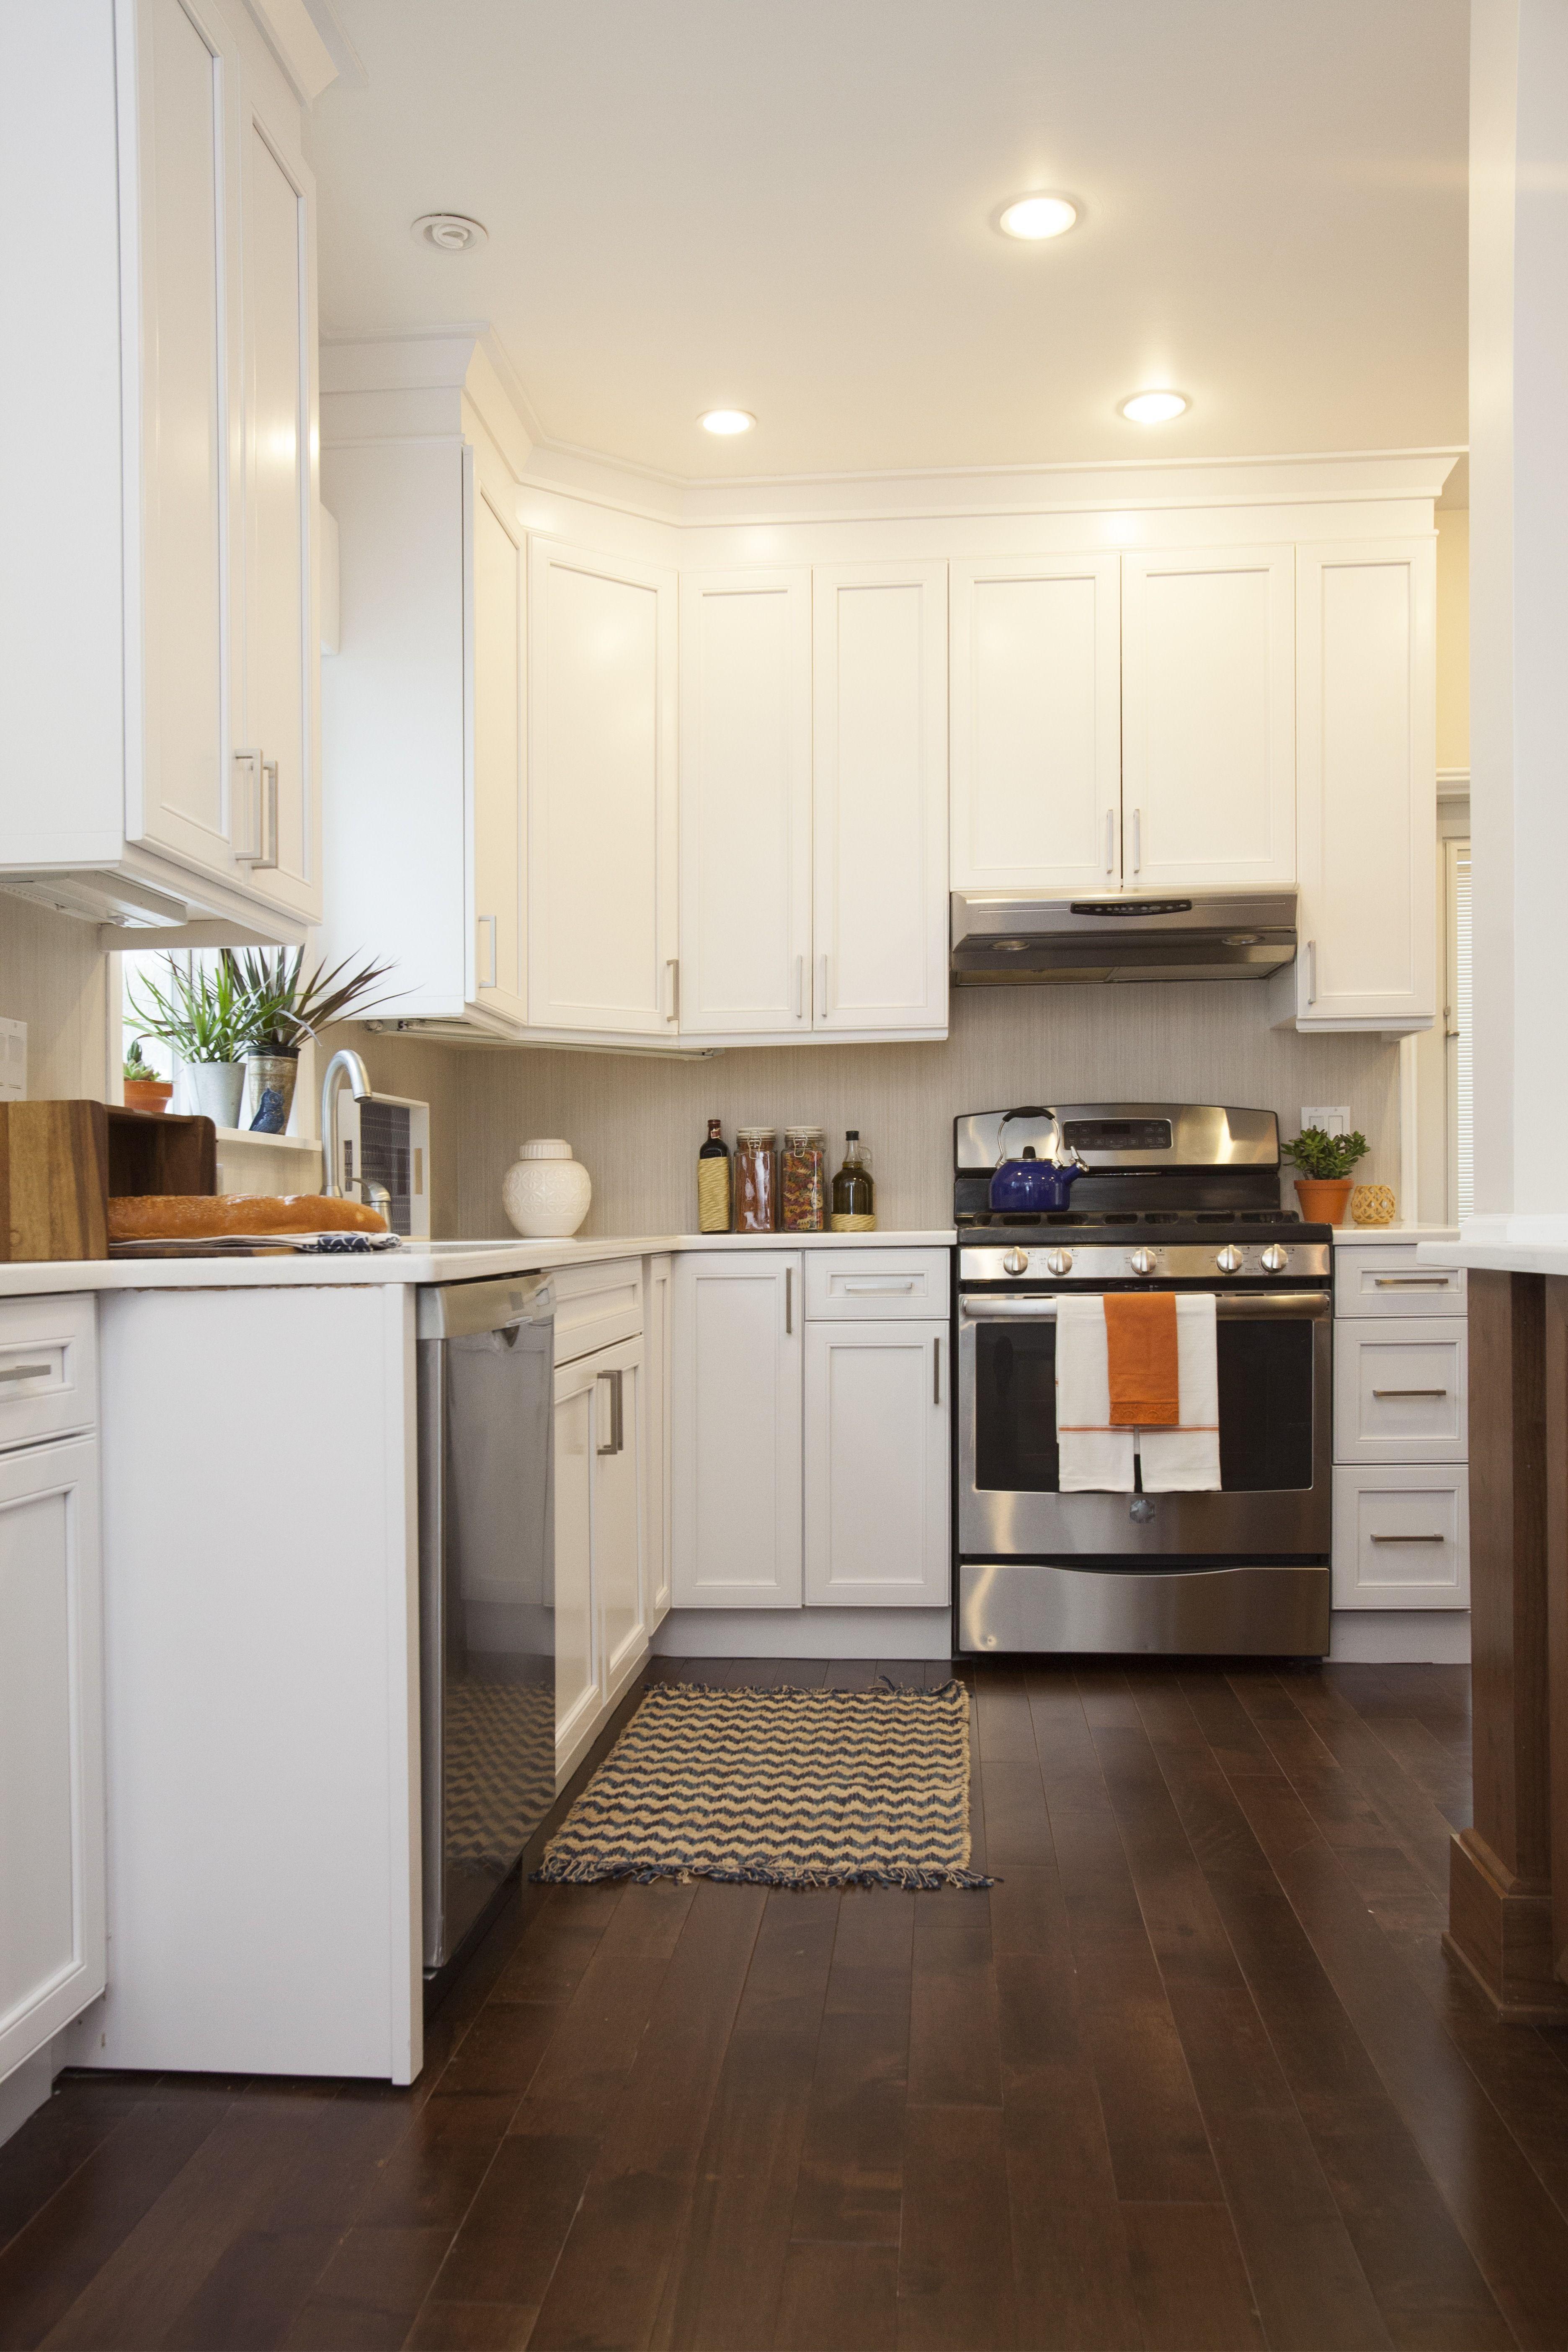 lana and joe 39 s kitchen reveal property brothers buying selling 315 lana joe pinterest. Black Bedroom Furniture Sets. Home Design Ideas